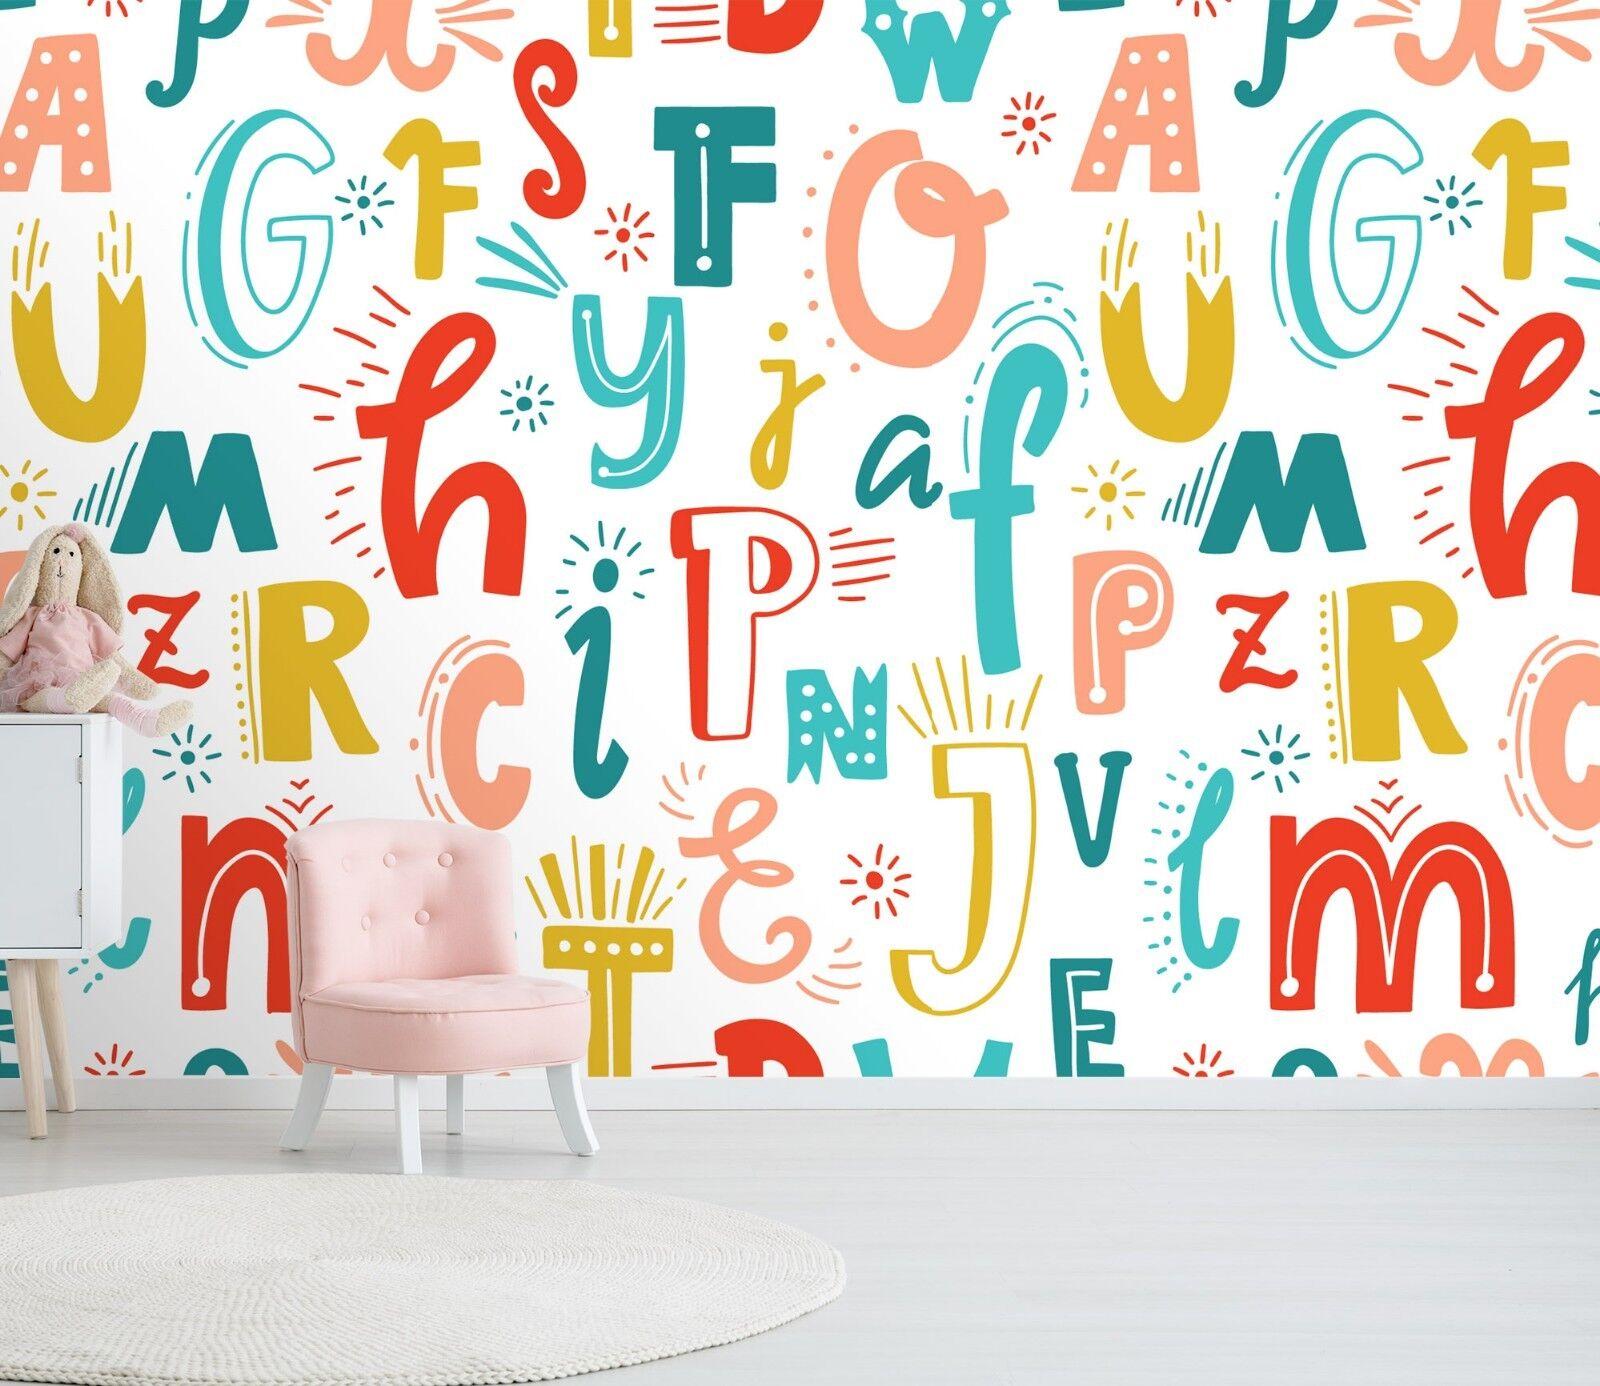 3D Fun Farbeful Text 53 Wallpaper Murals Wall Print Wallpaper Mural AJ WALL AU